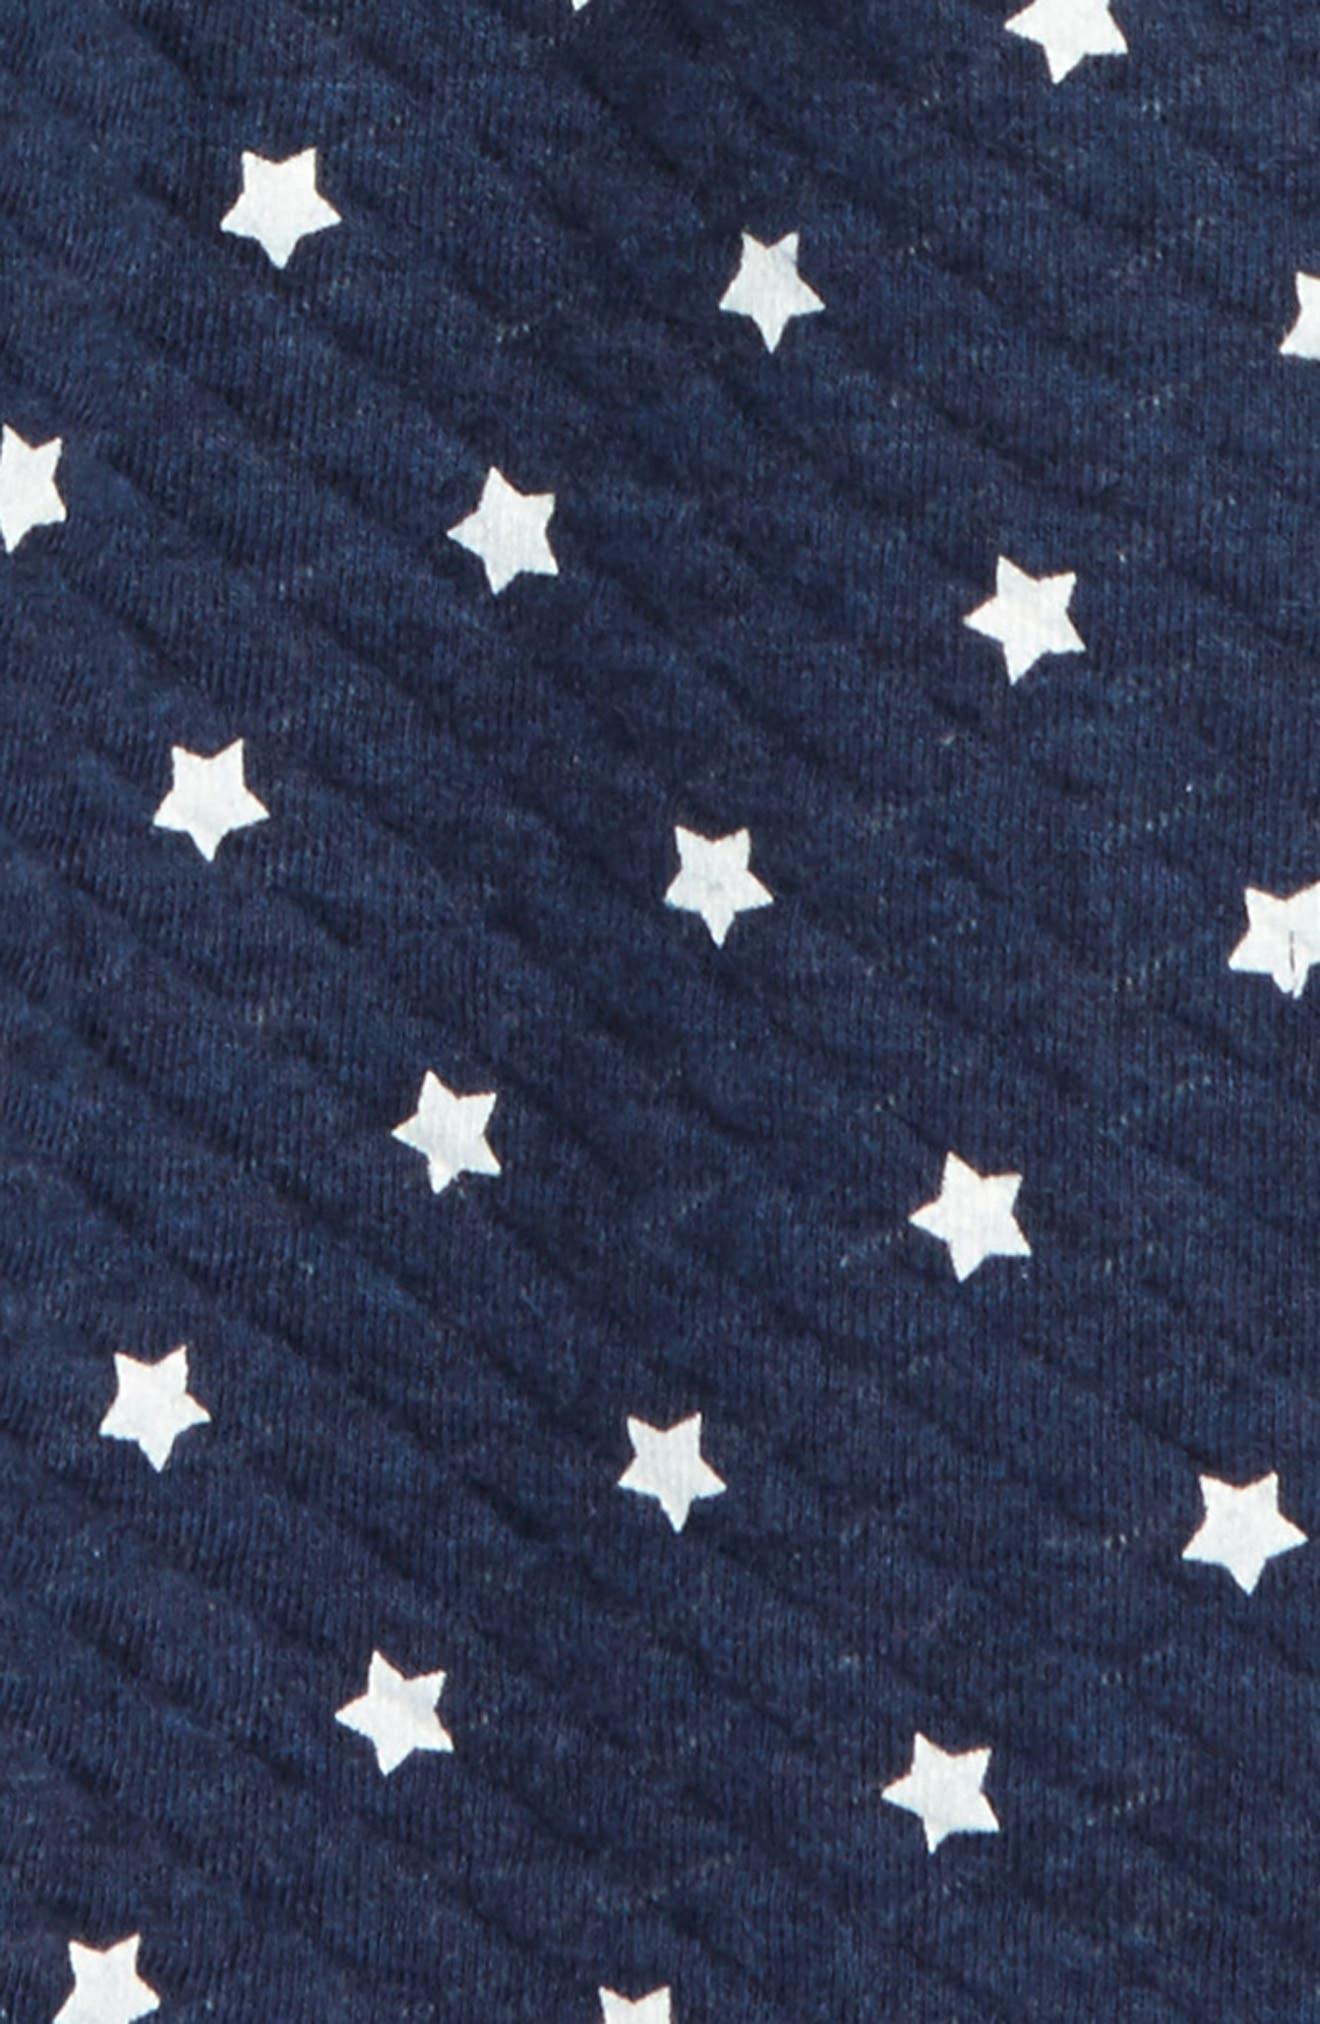 Thea Star Skirt,                             Alternate thumbnail 2, color,                             Navy Peacoat Heather Stars